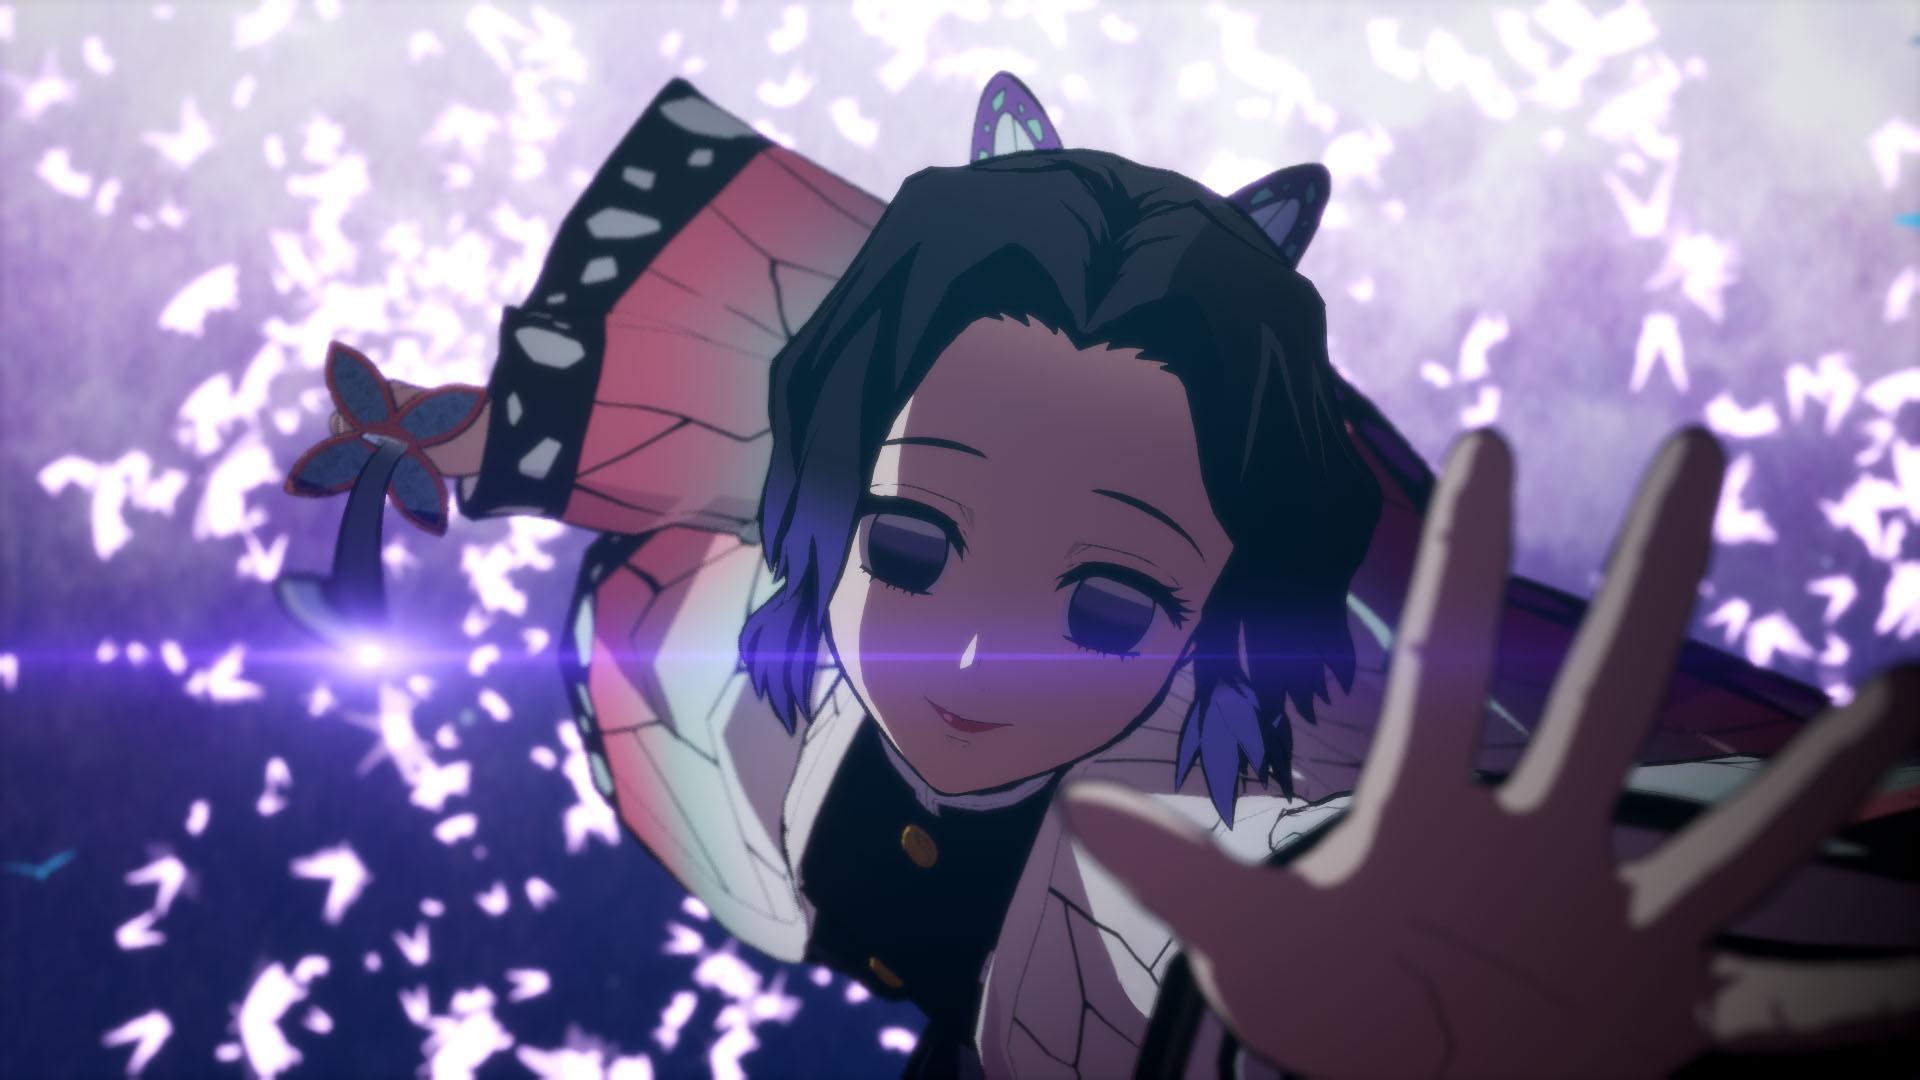 Demon Slayer Kimetsu no Yaiba The Hinokami Chronicles - Announce (16)-36360360cce905073fb1